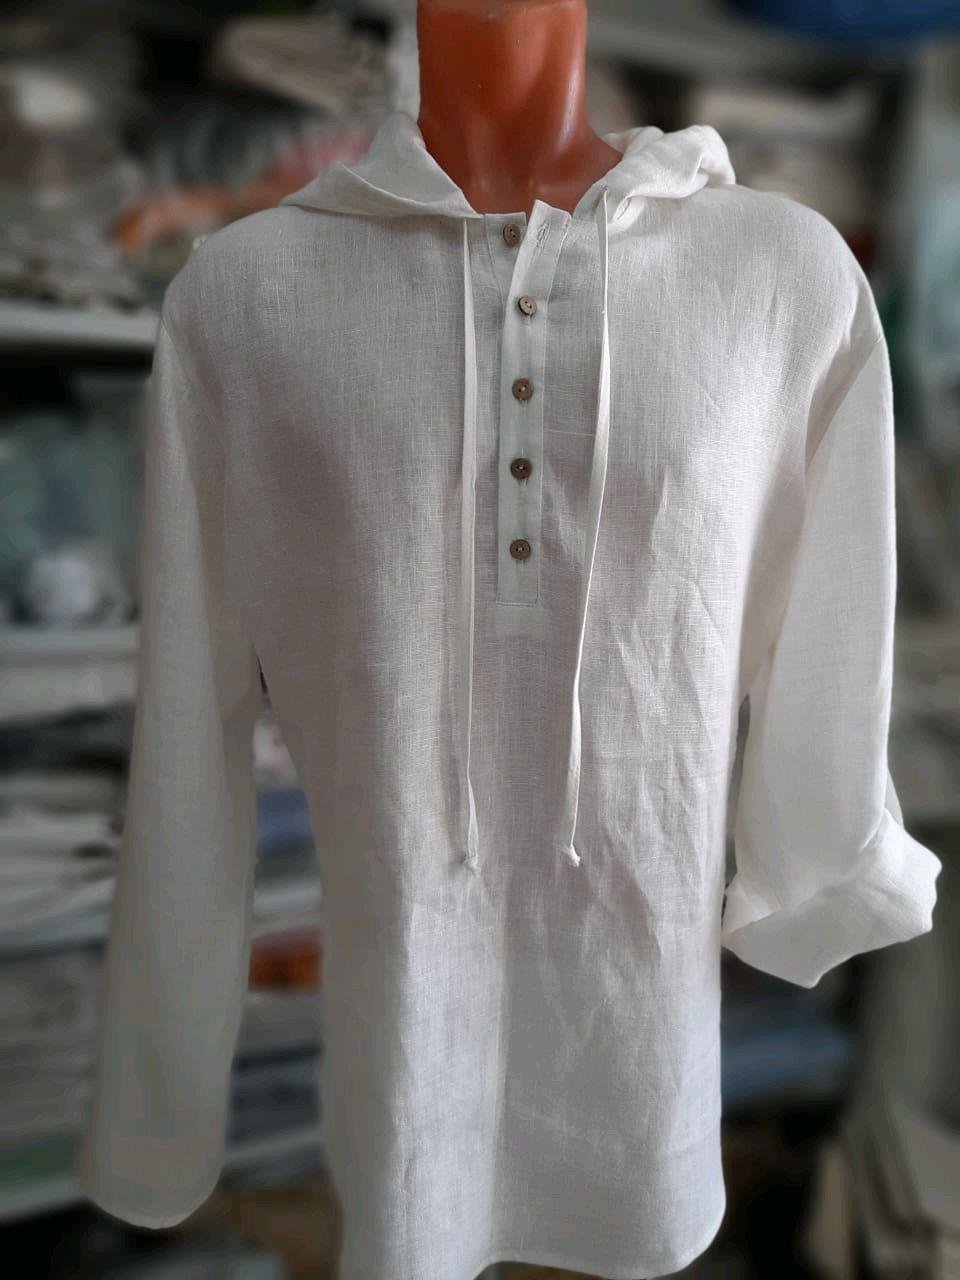 Рубашка лен 100% с капюшоном, Рубашки мужские, Кострома,  Фото №1